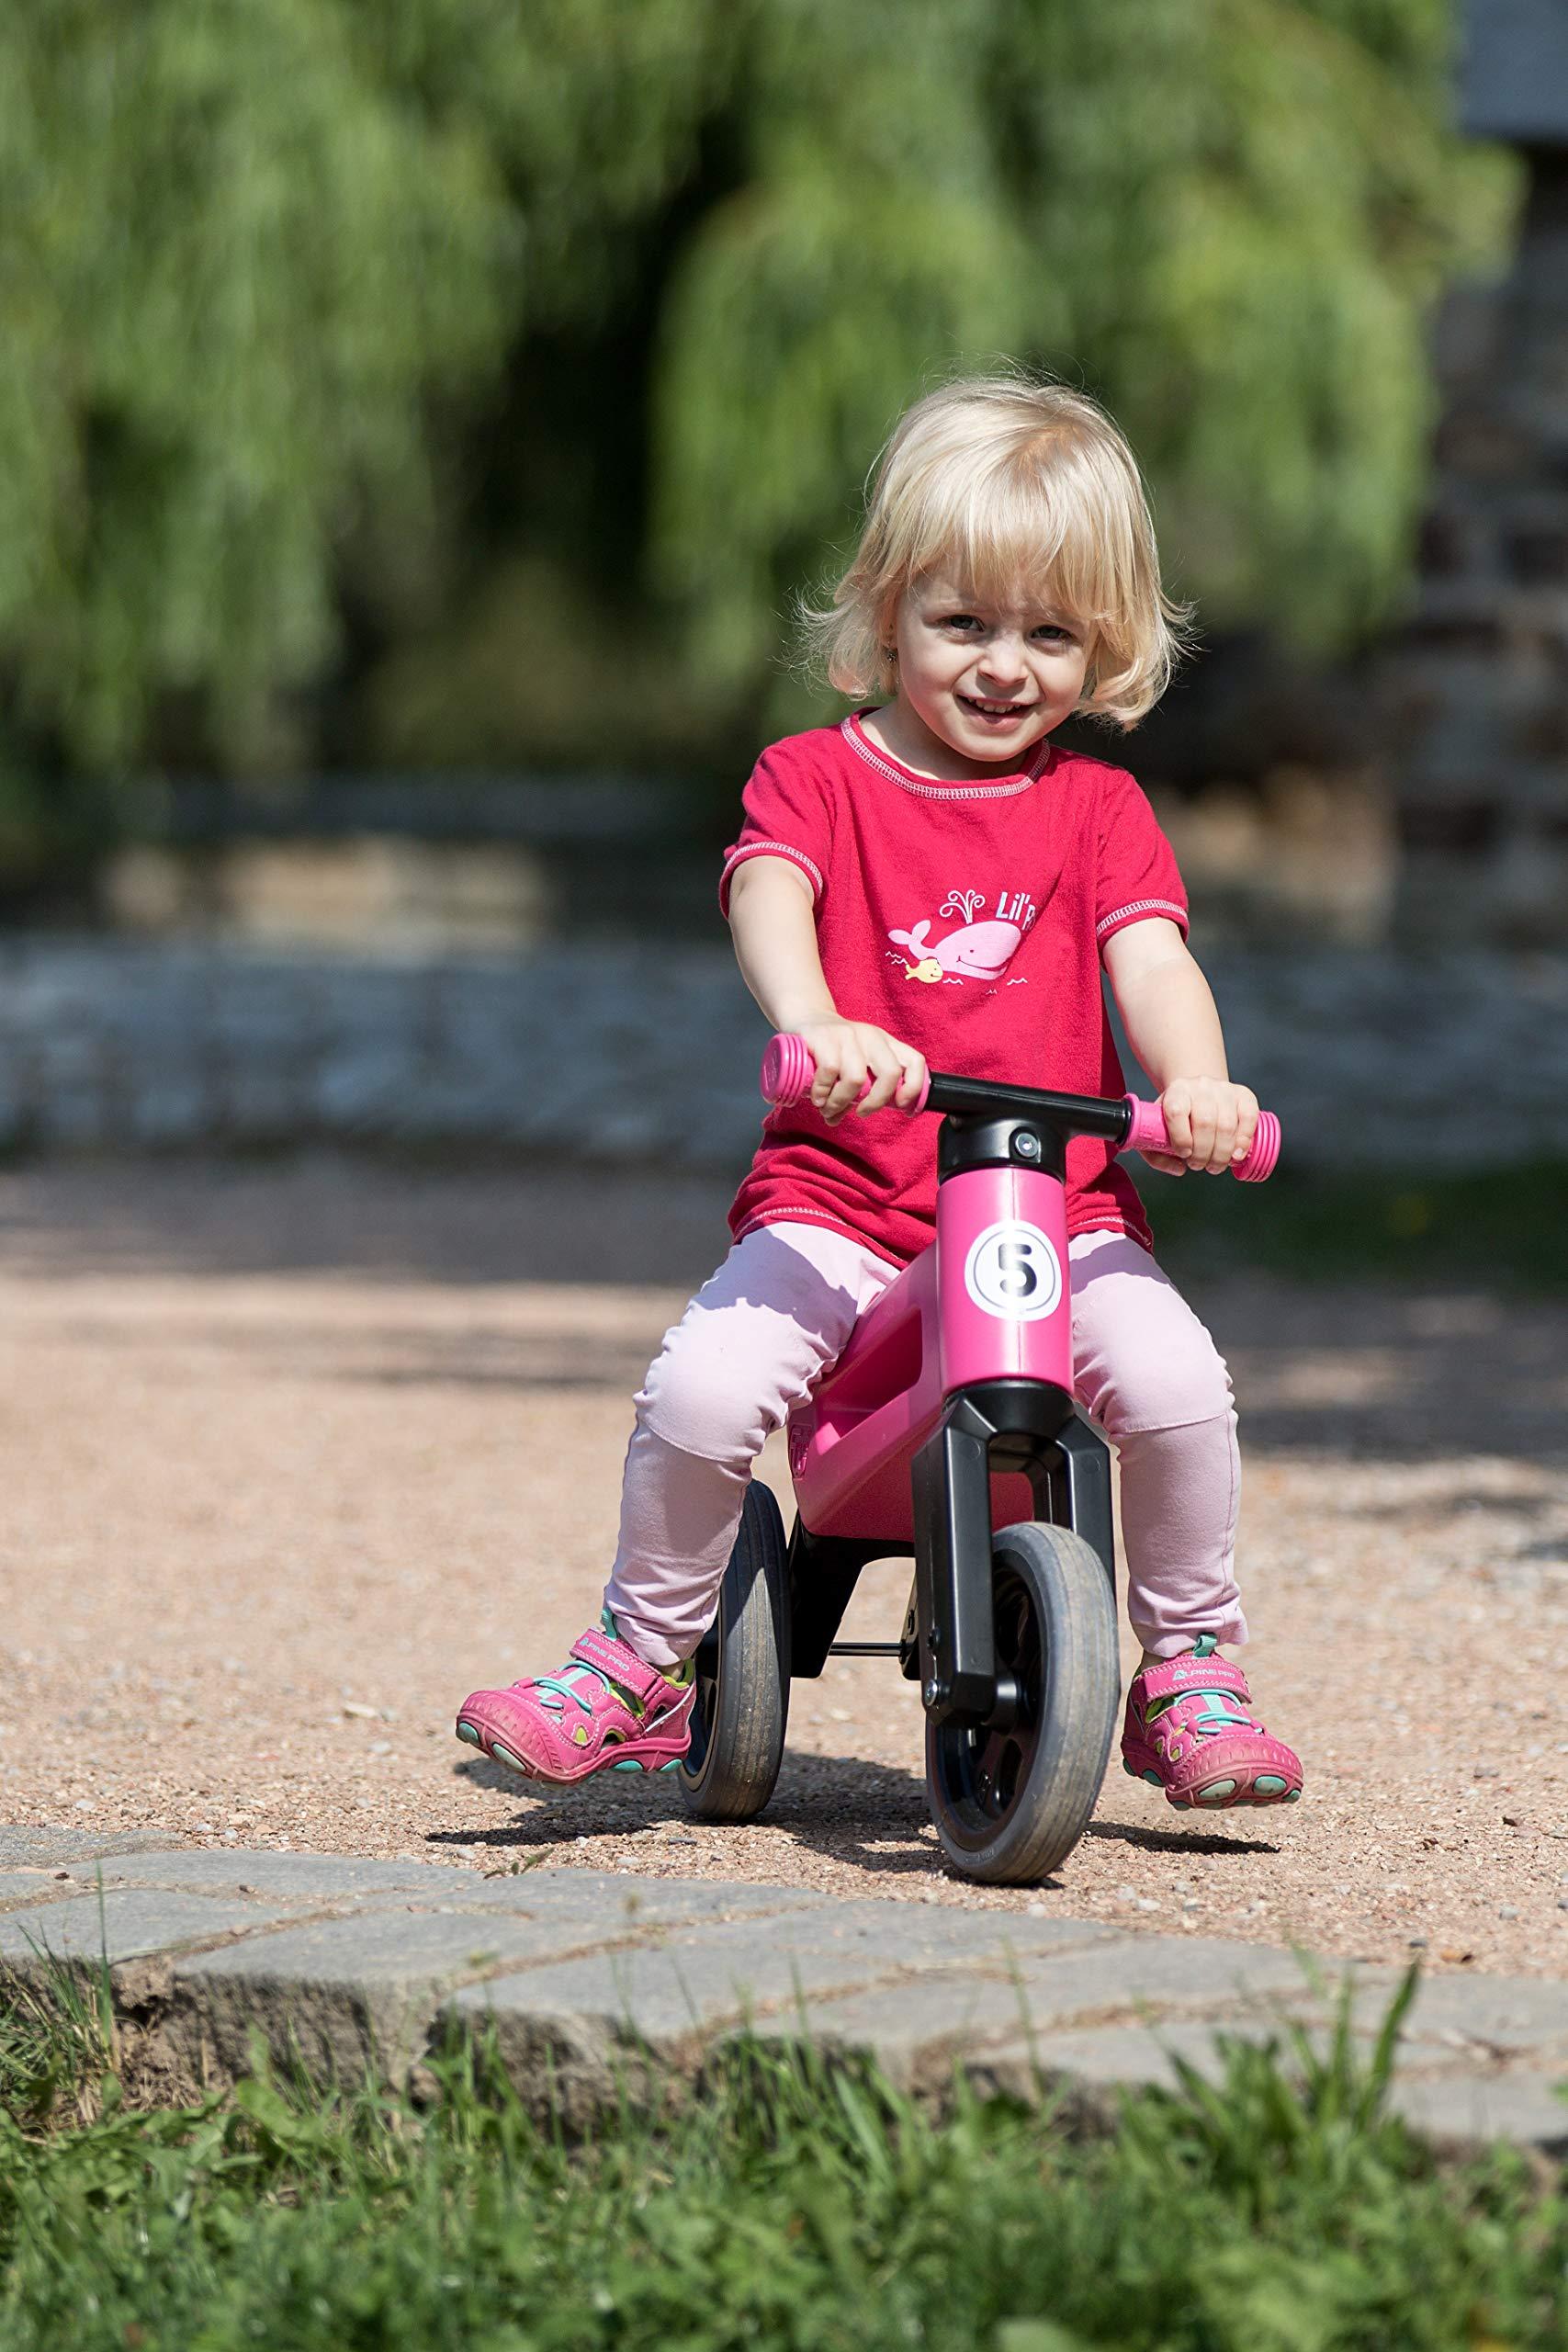 PlayMonster Free Wheelin' Rider Convertible Balance Bike, Pink by PlayMonster (Image #6)